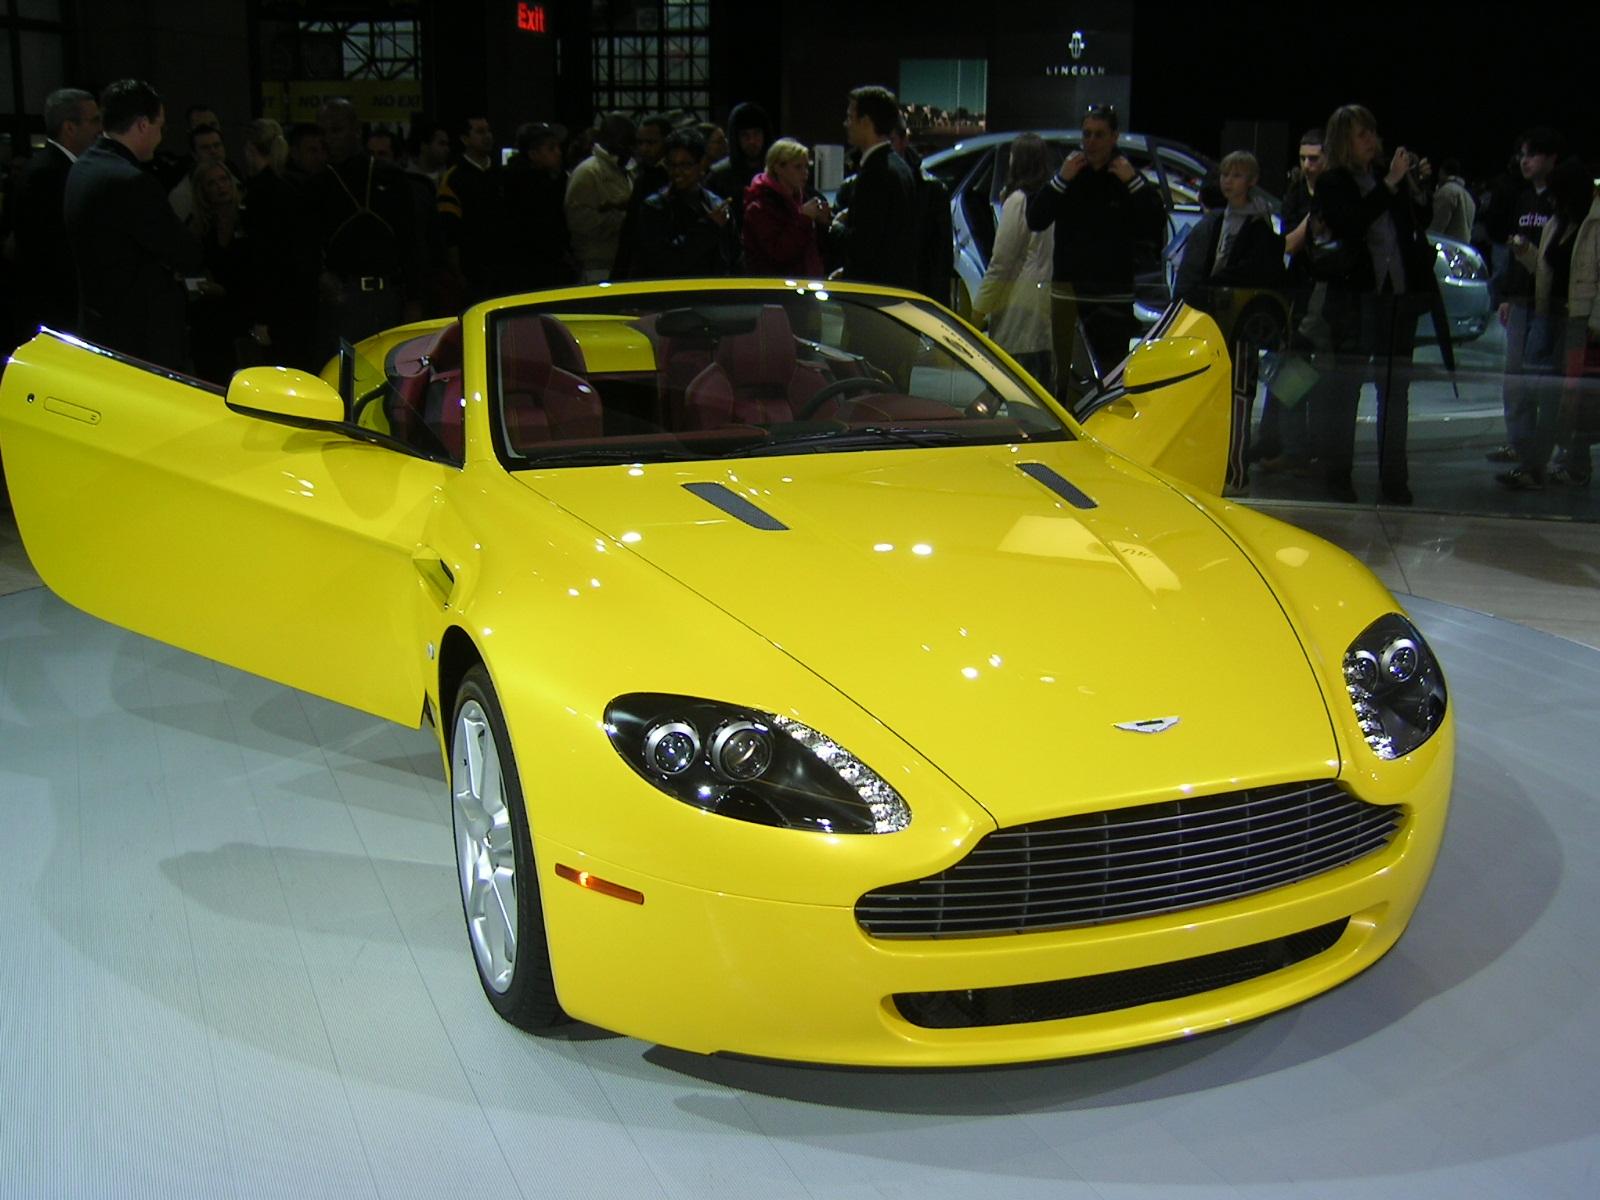 Plik Aston martin vanquish JPG – wolna encyklopedia